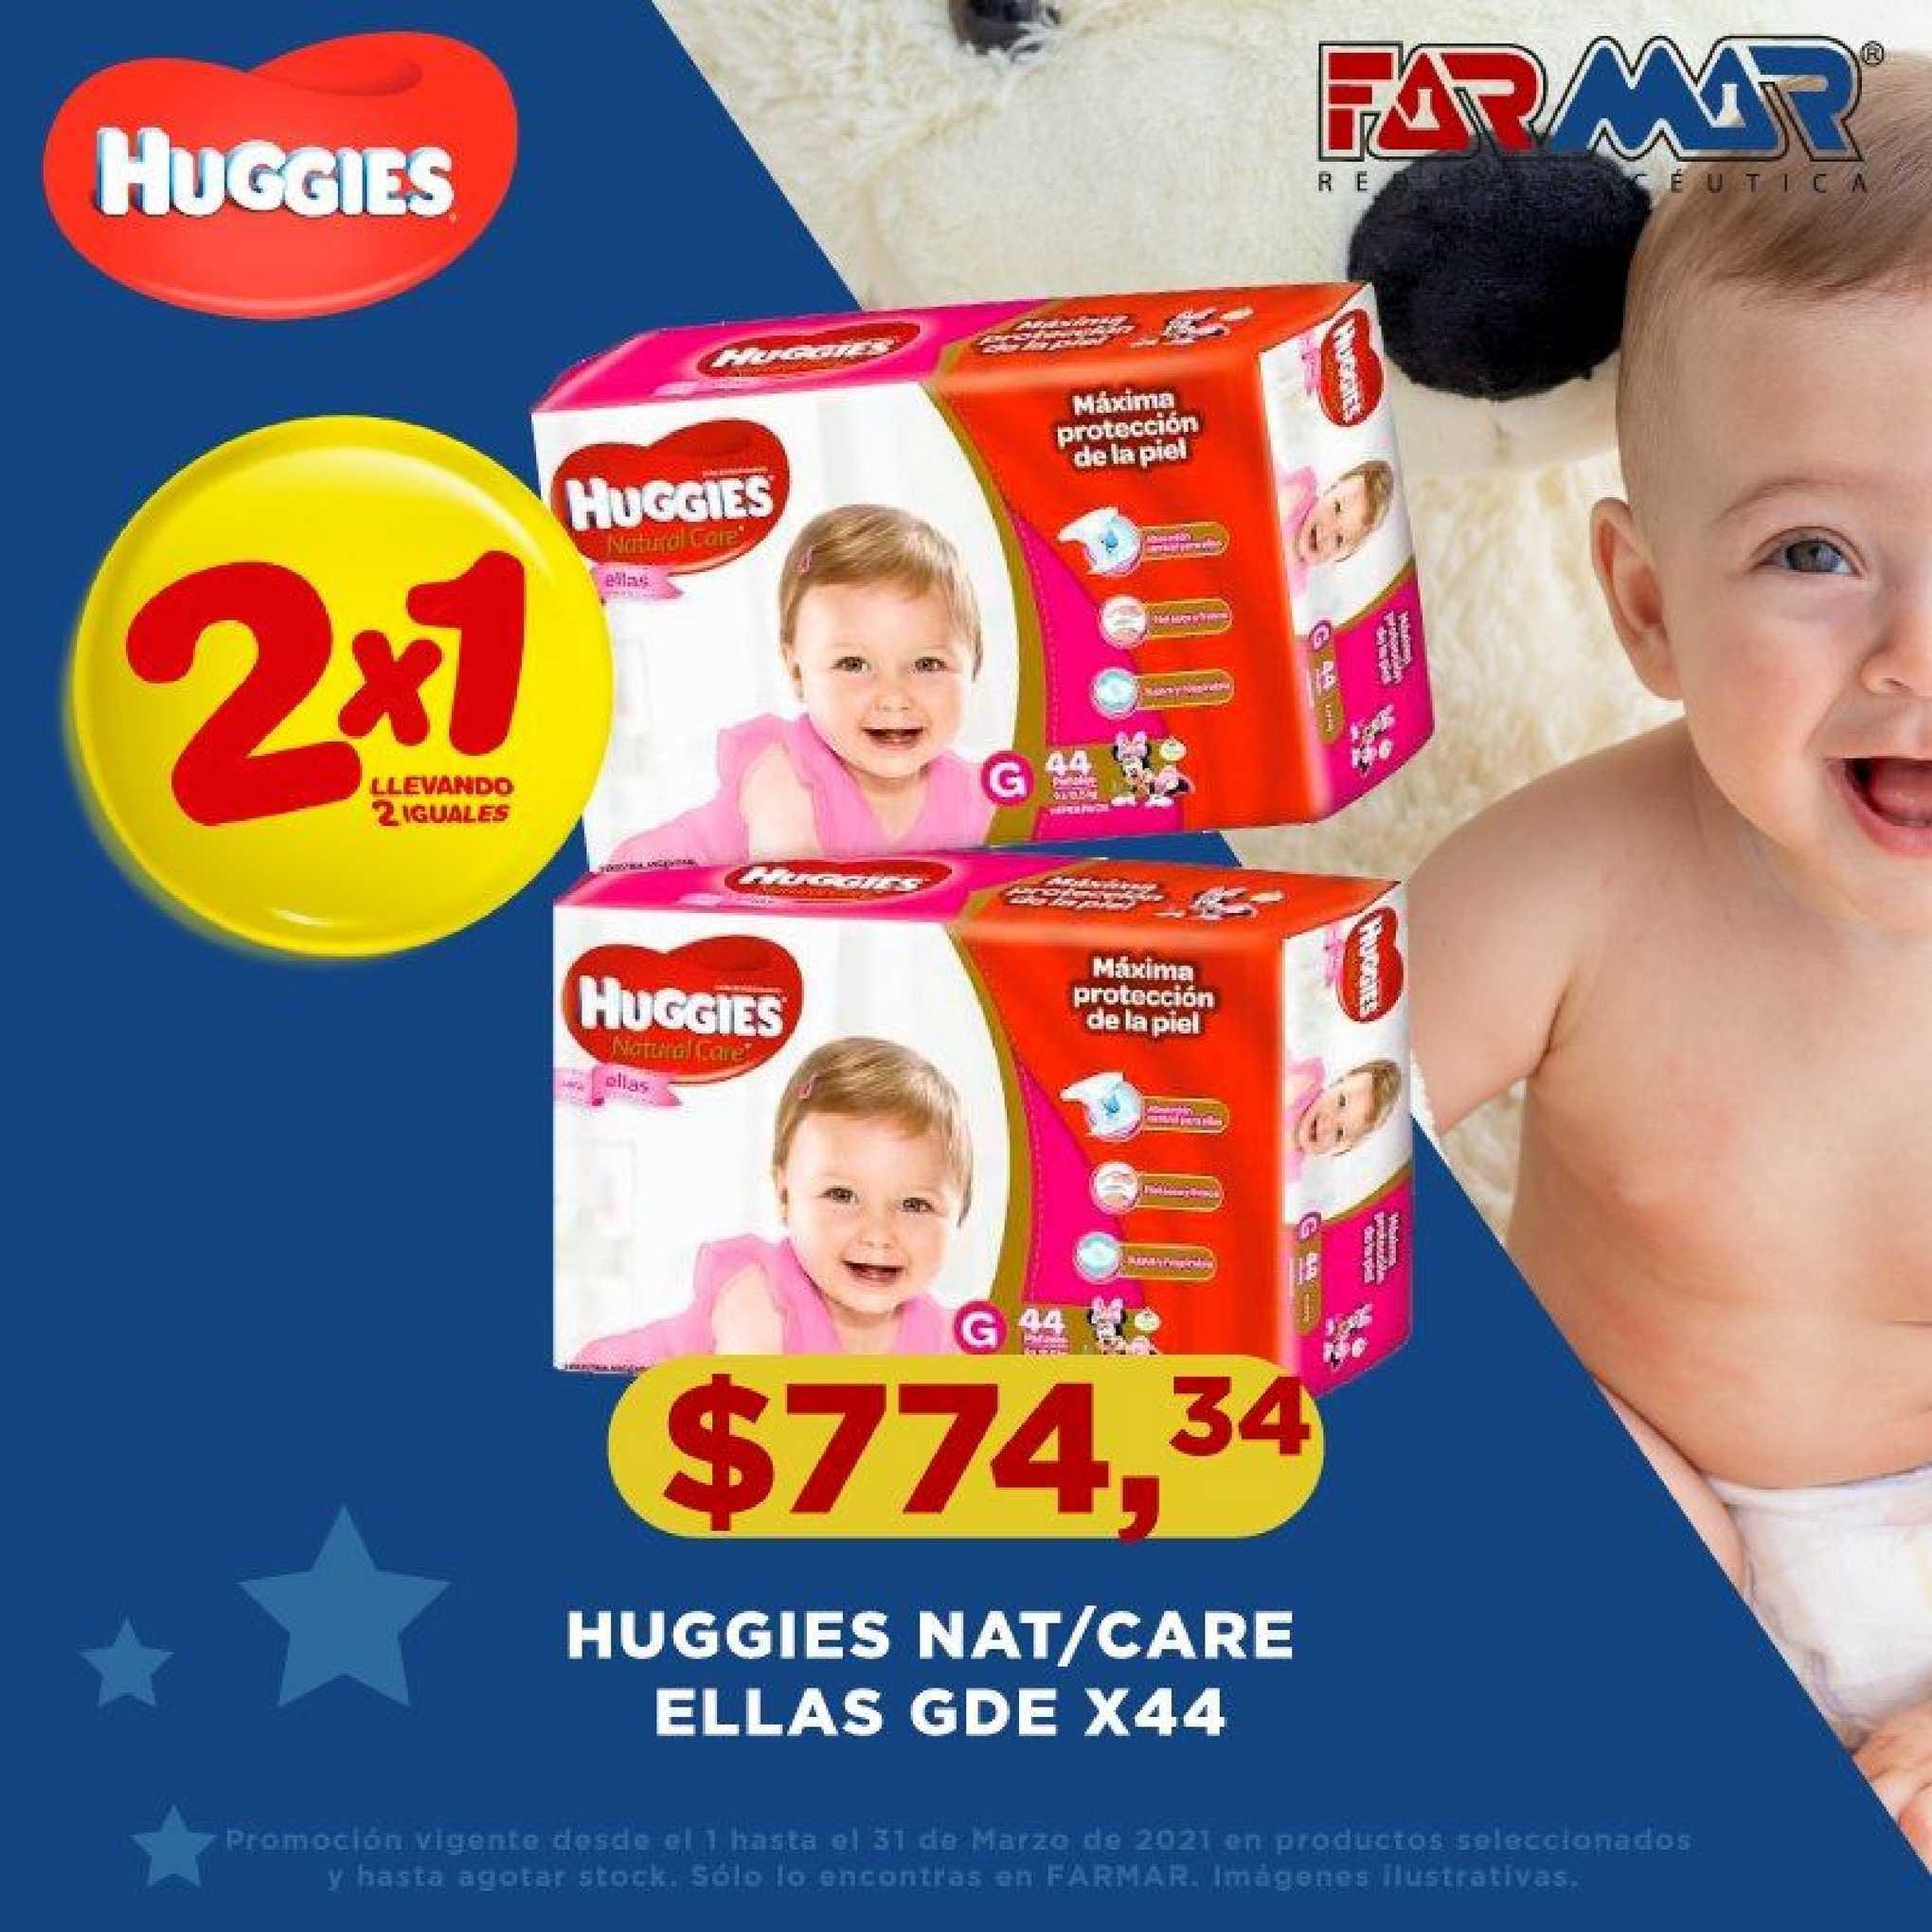 Farmar Huggies Nat-care Ellas GDE X44